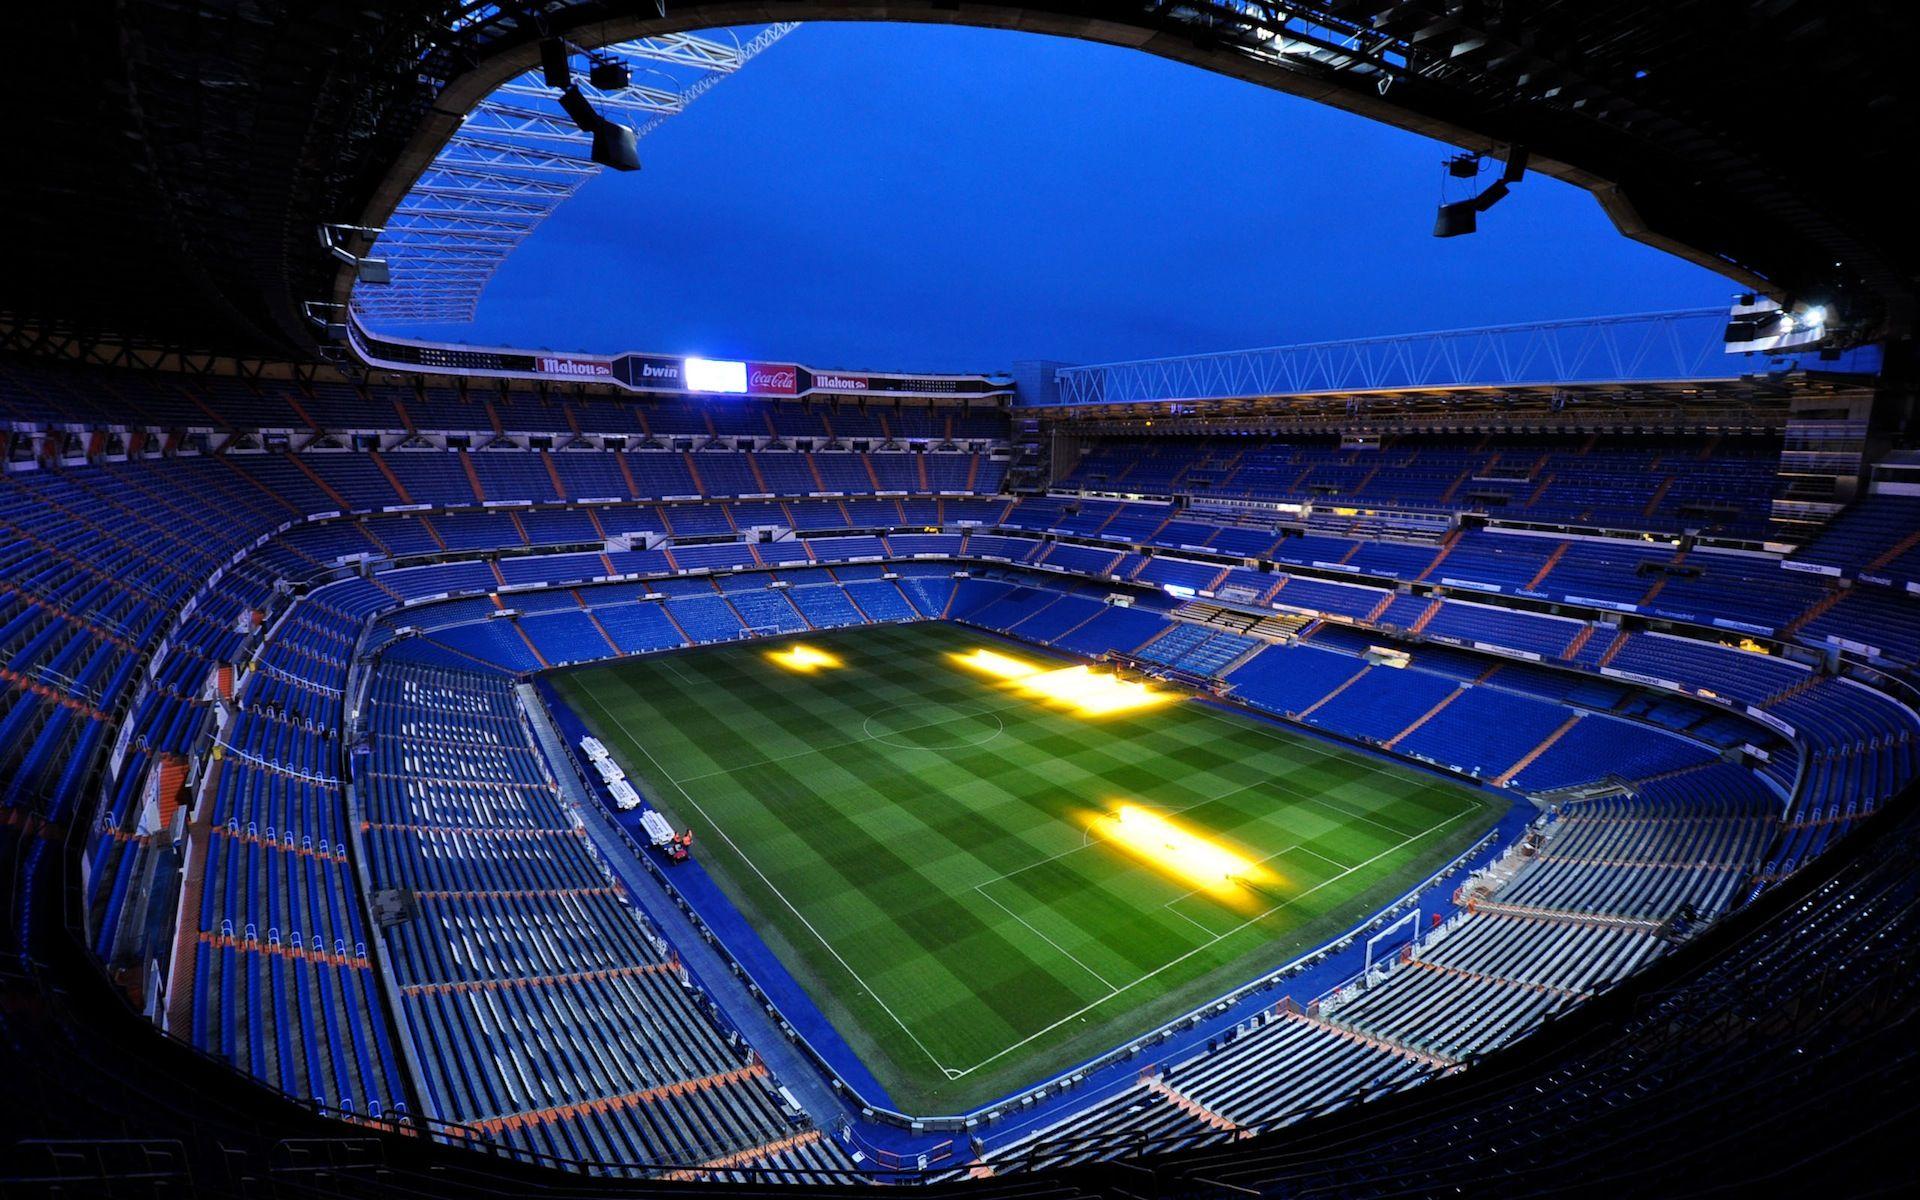 Santiago Bernabeu Real Madrid Stadium Hd Wallpaper Real Madrid Wallpapers Madrid Wallpaper Real Madrid Logo Wallpapers